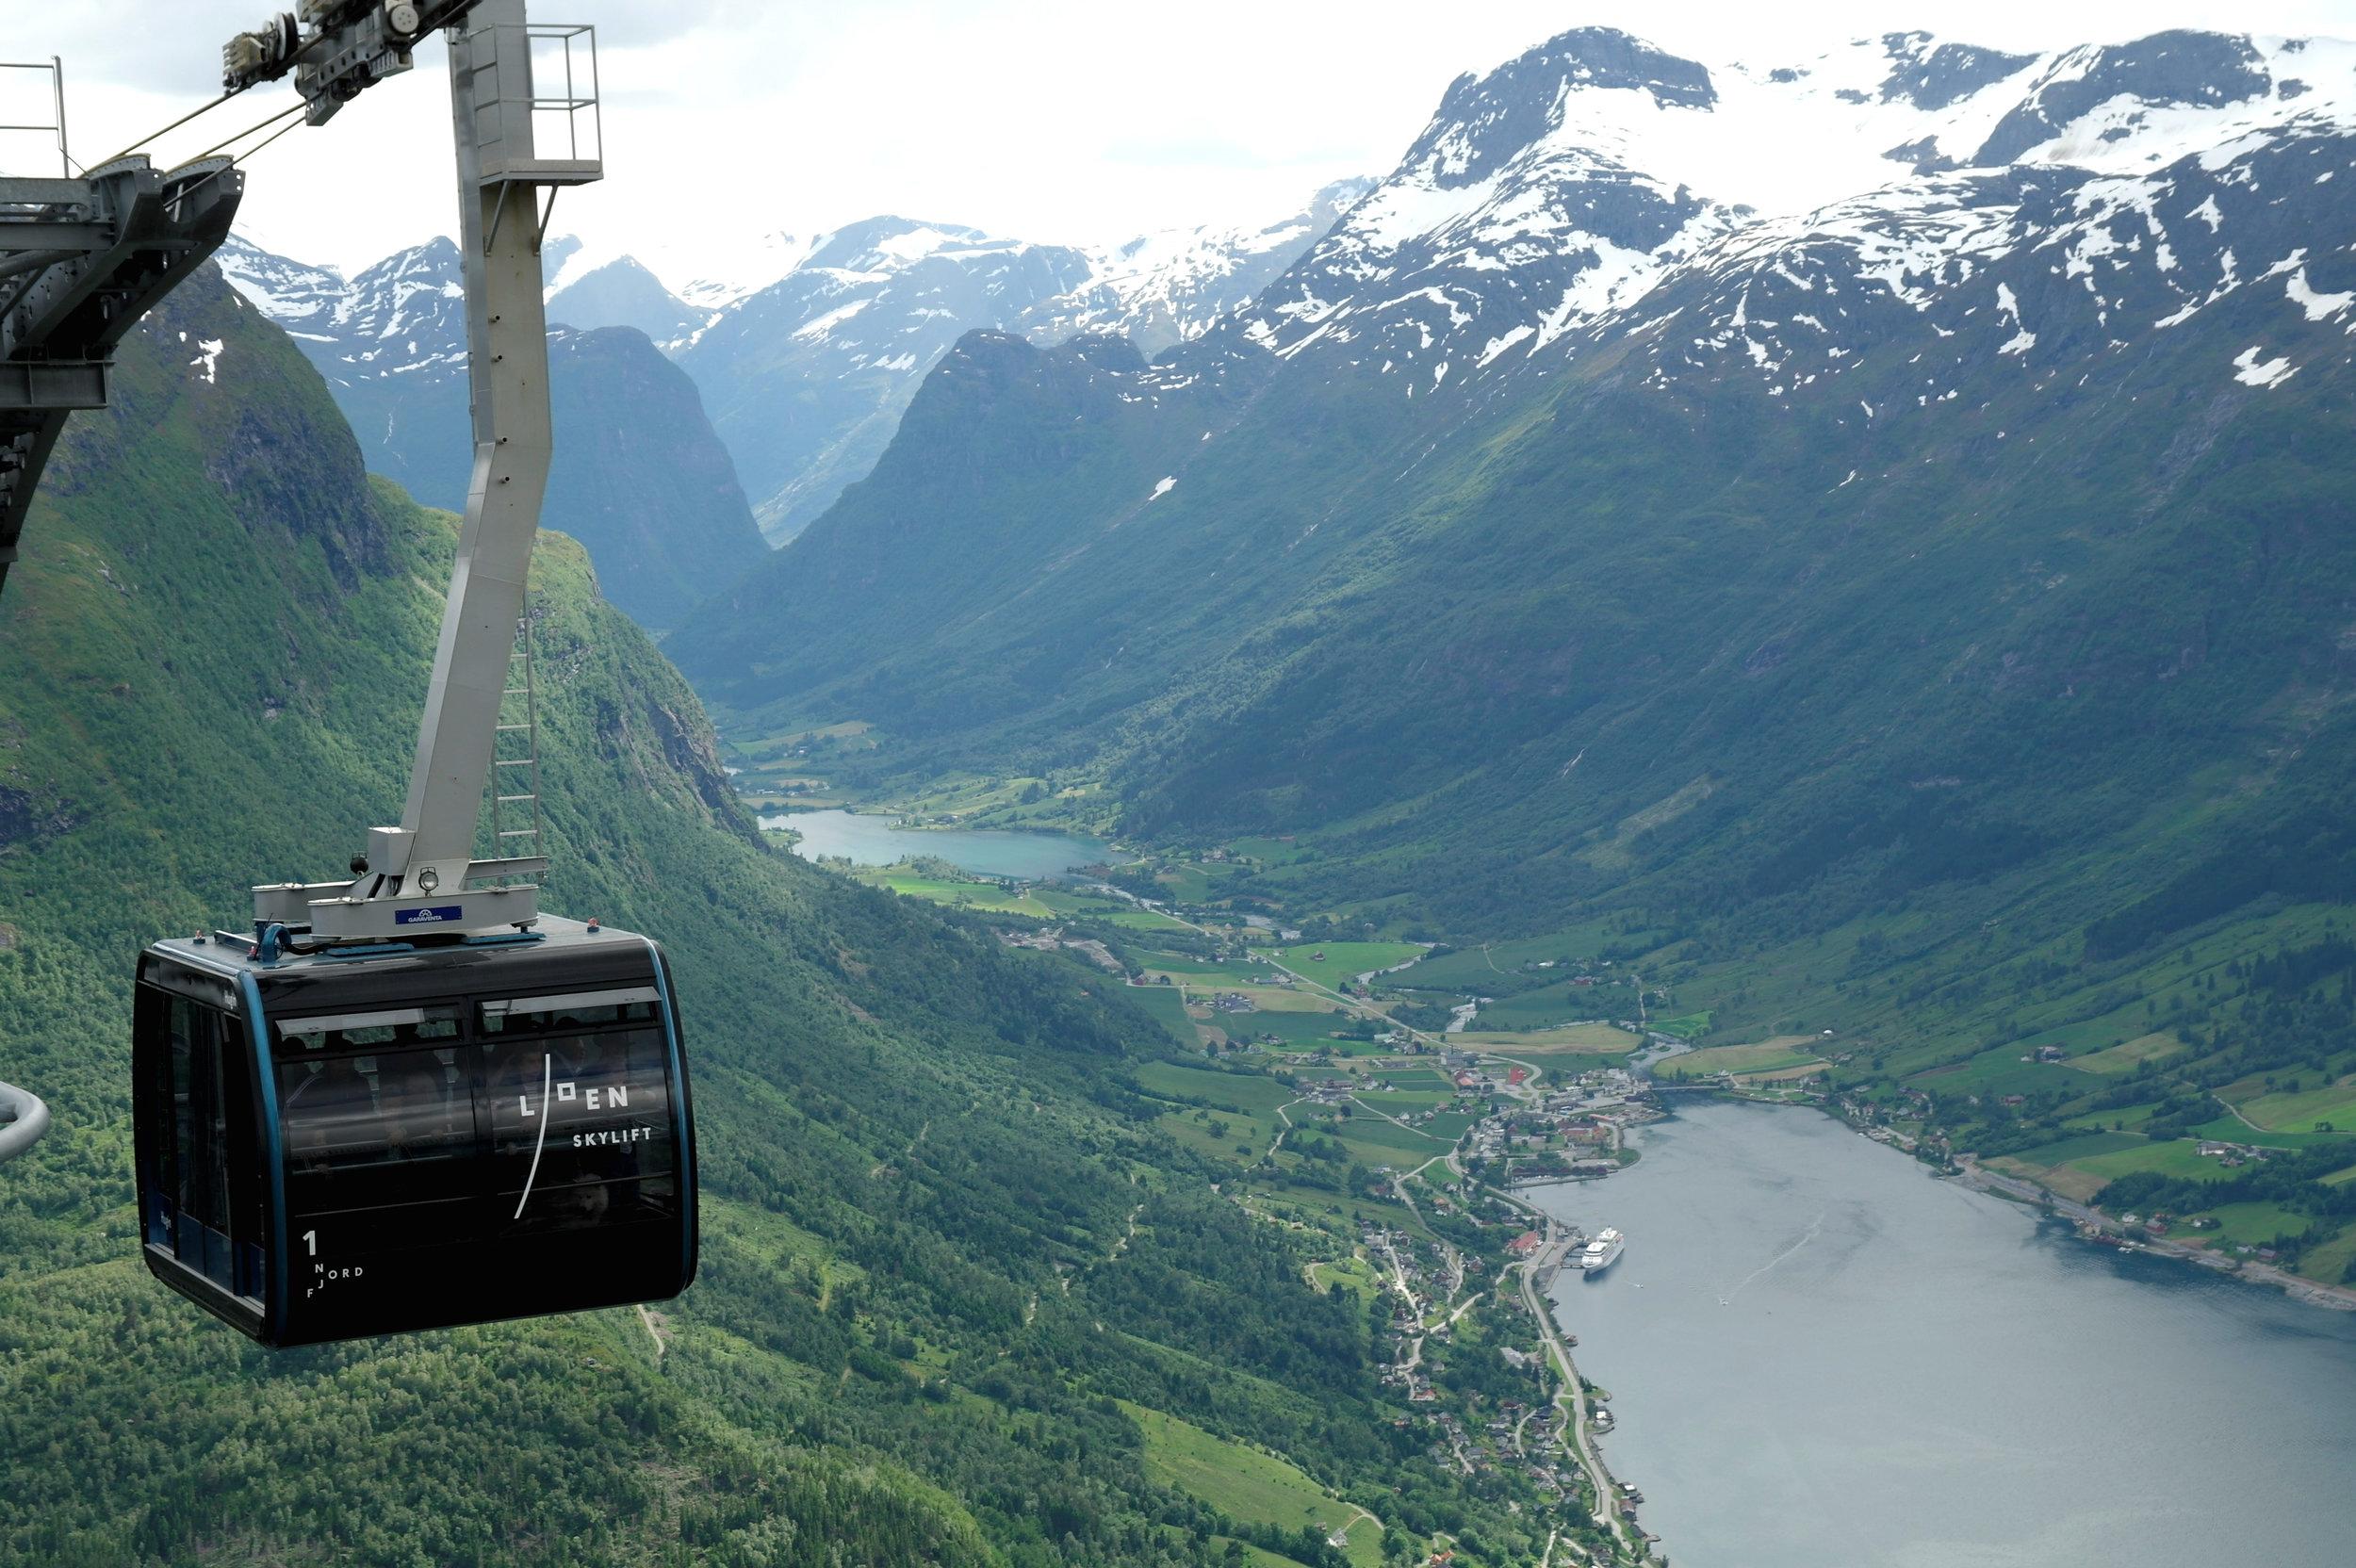 Loen Skylift -